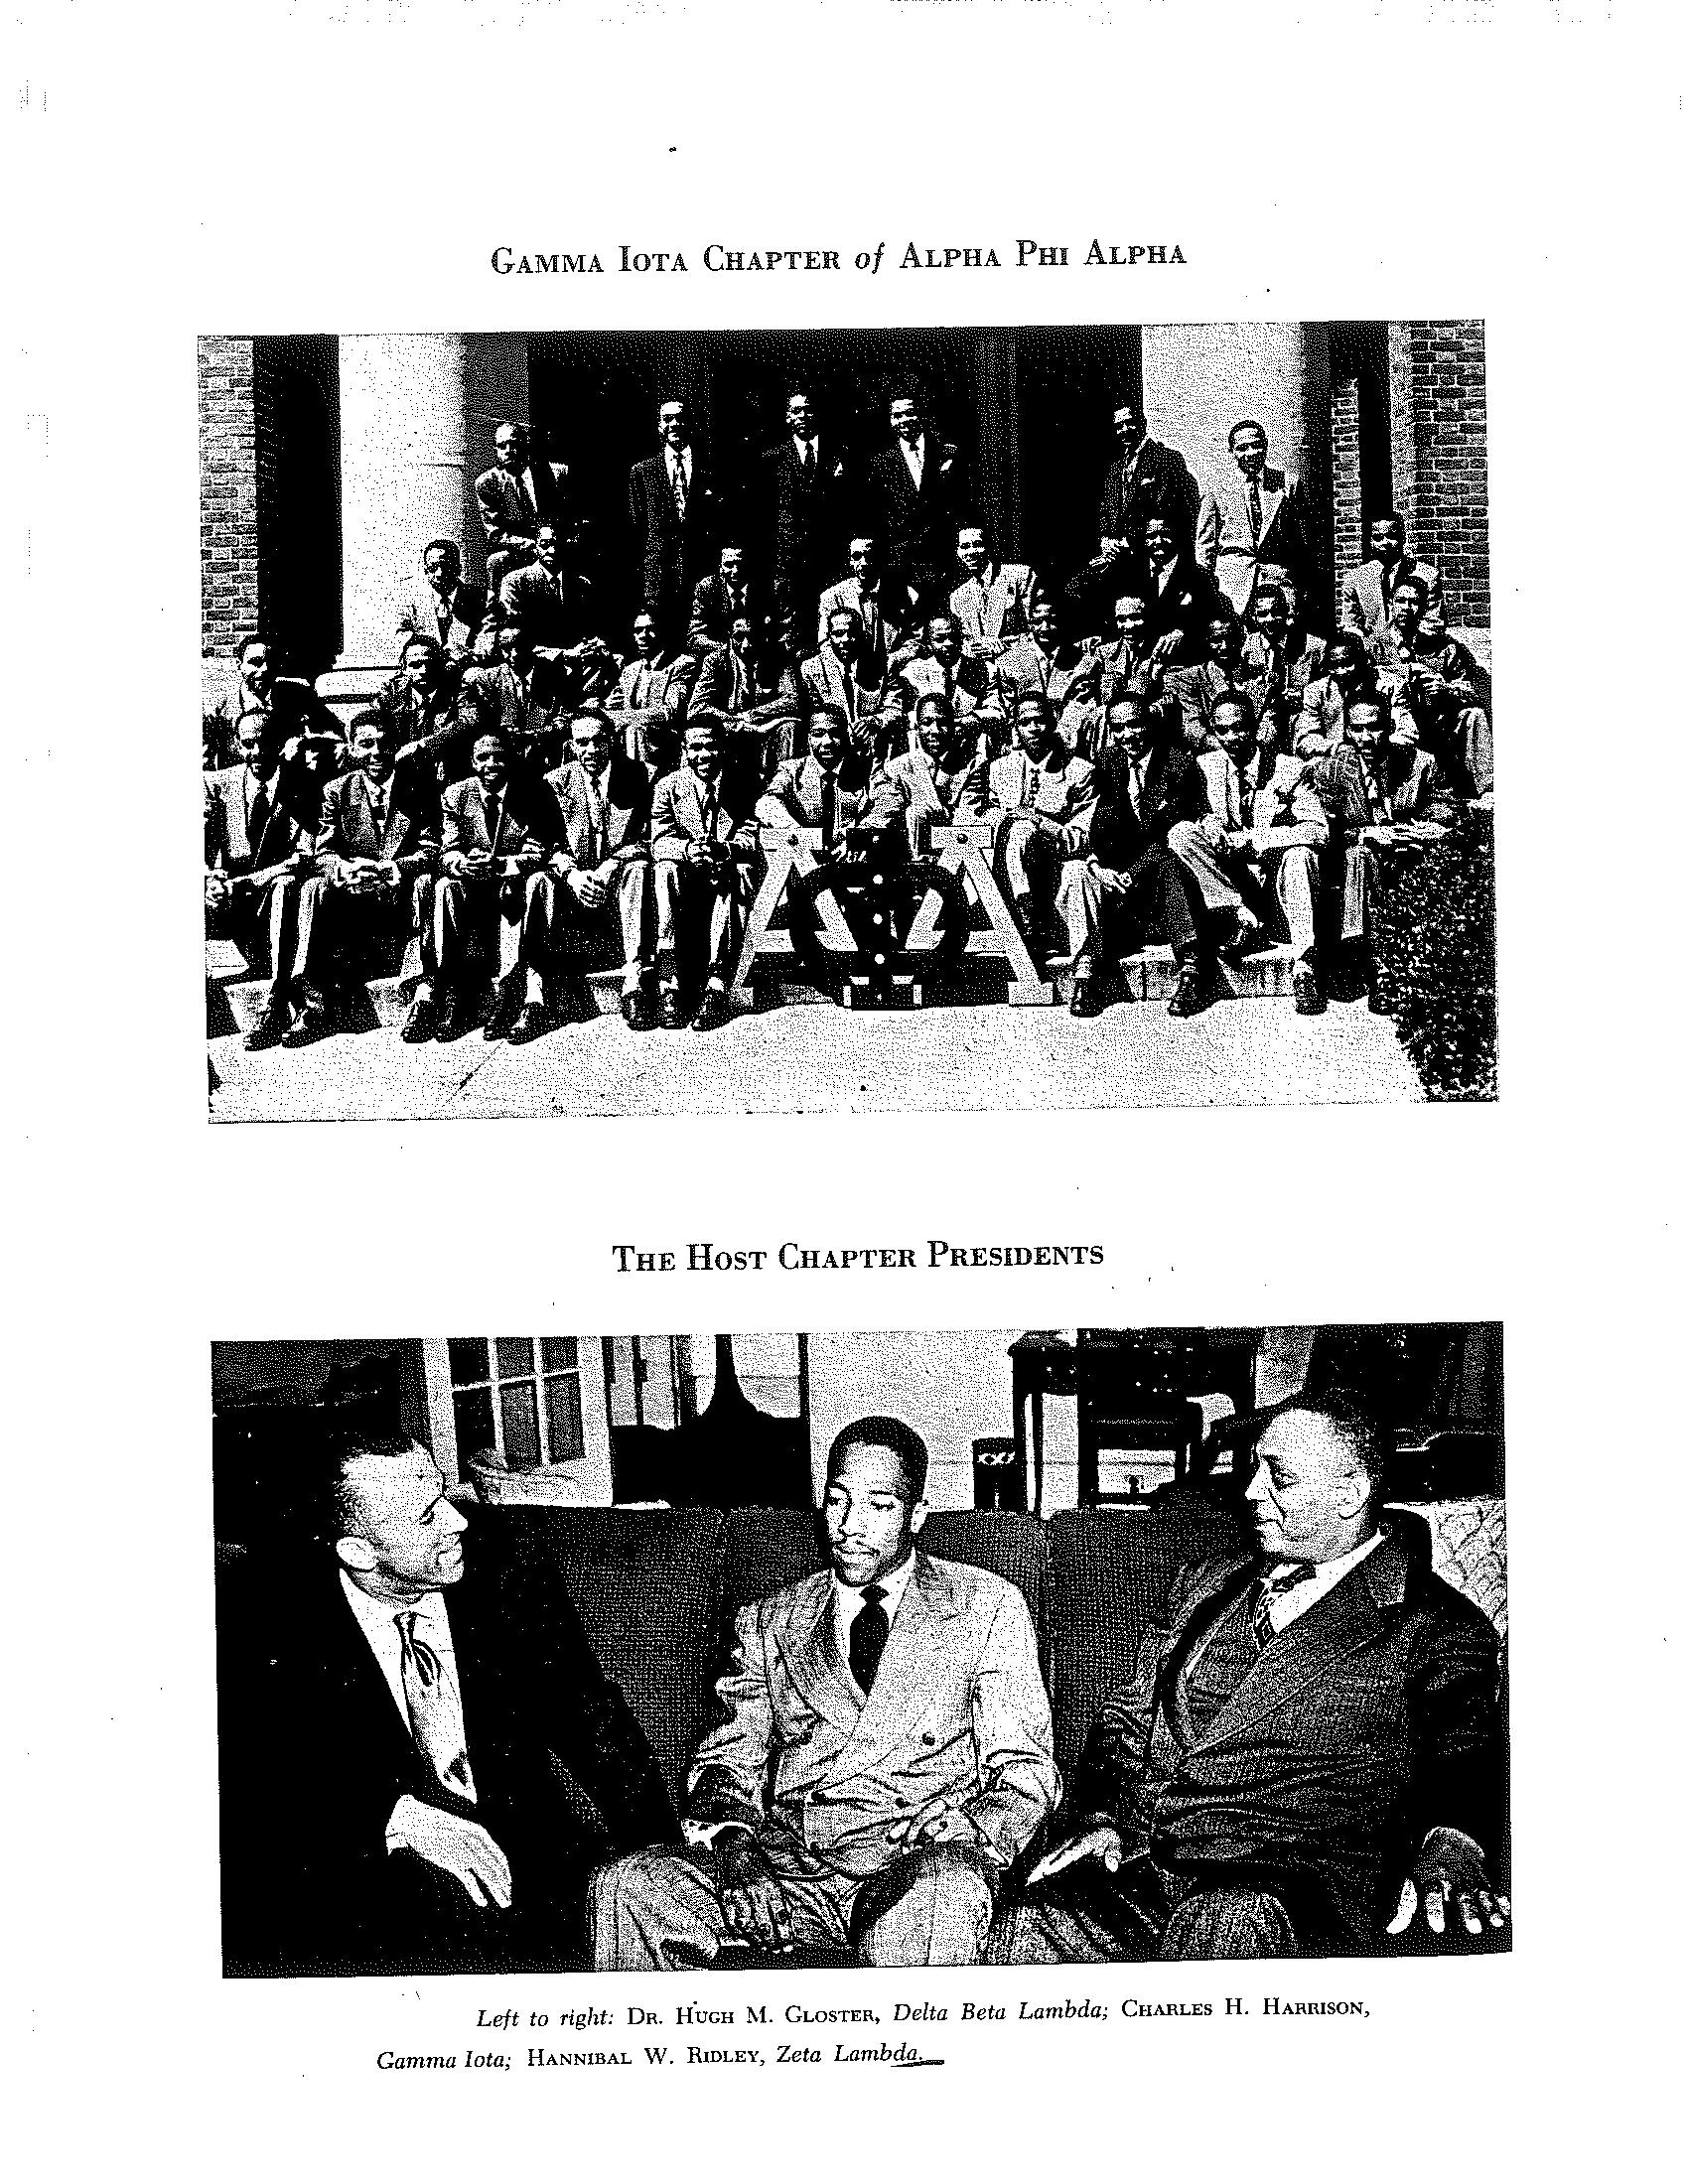 Zeta Lambda 1950 - Eastern Region Convention Host Presidents.png